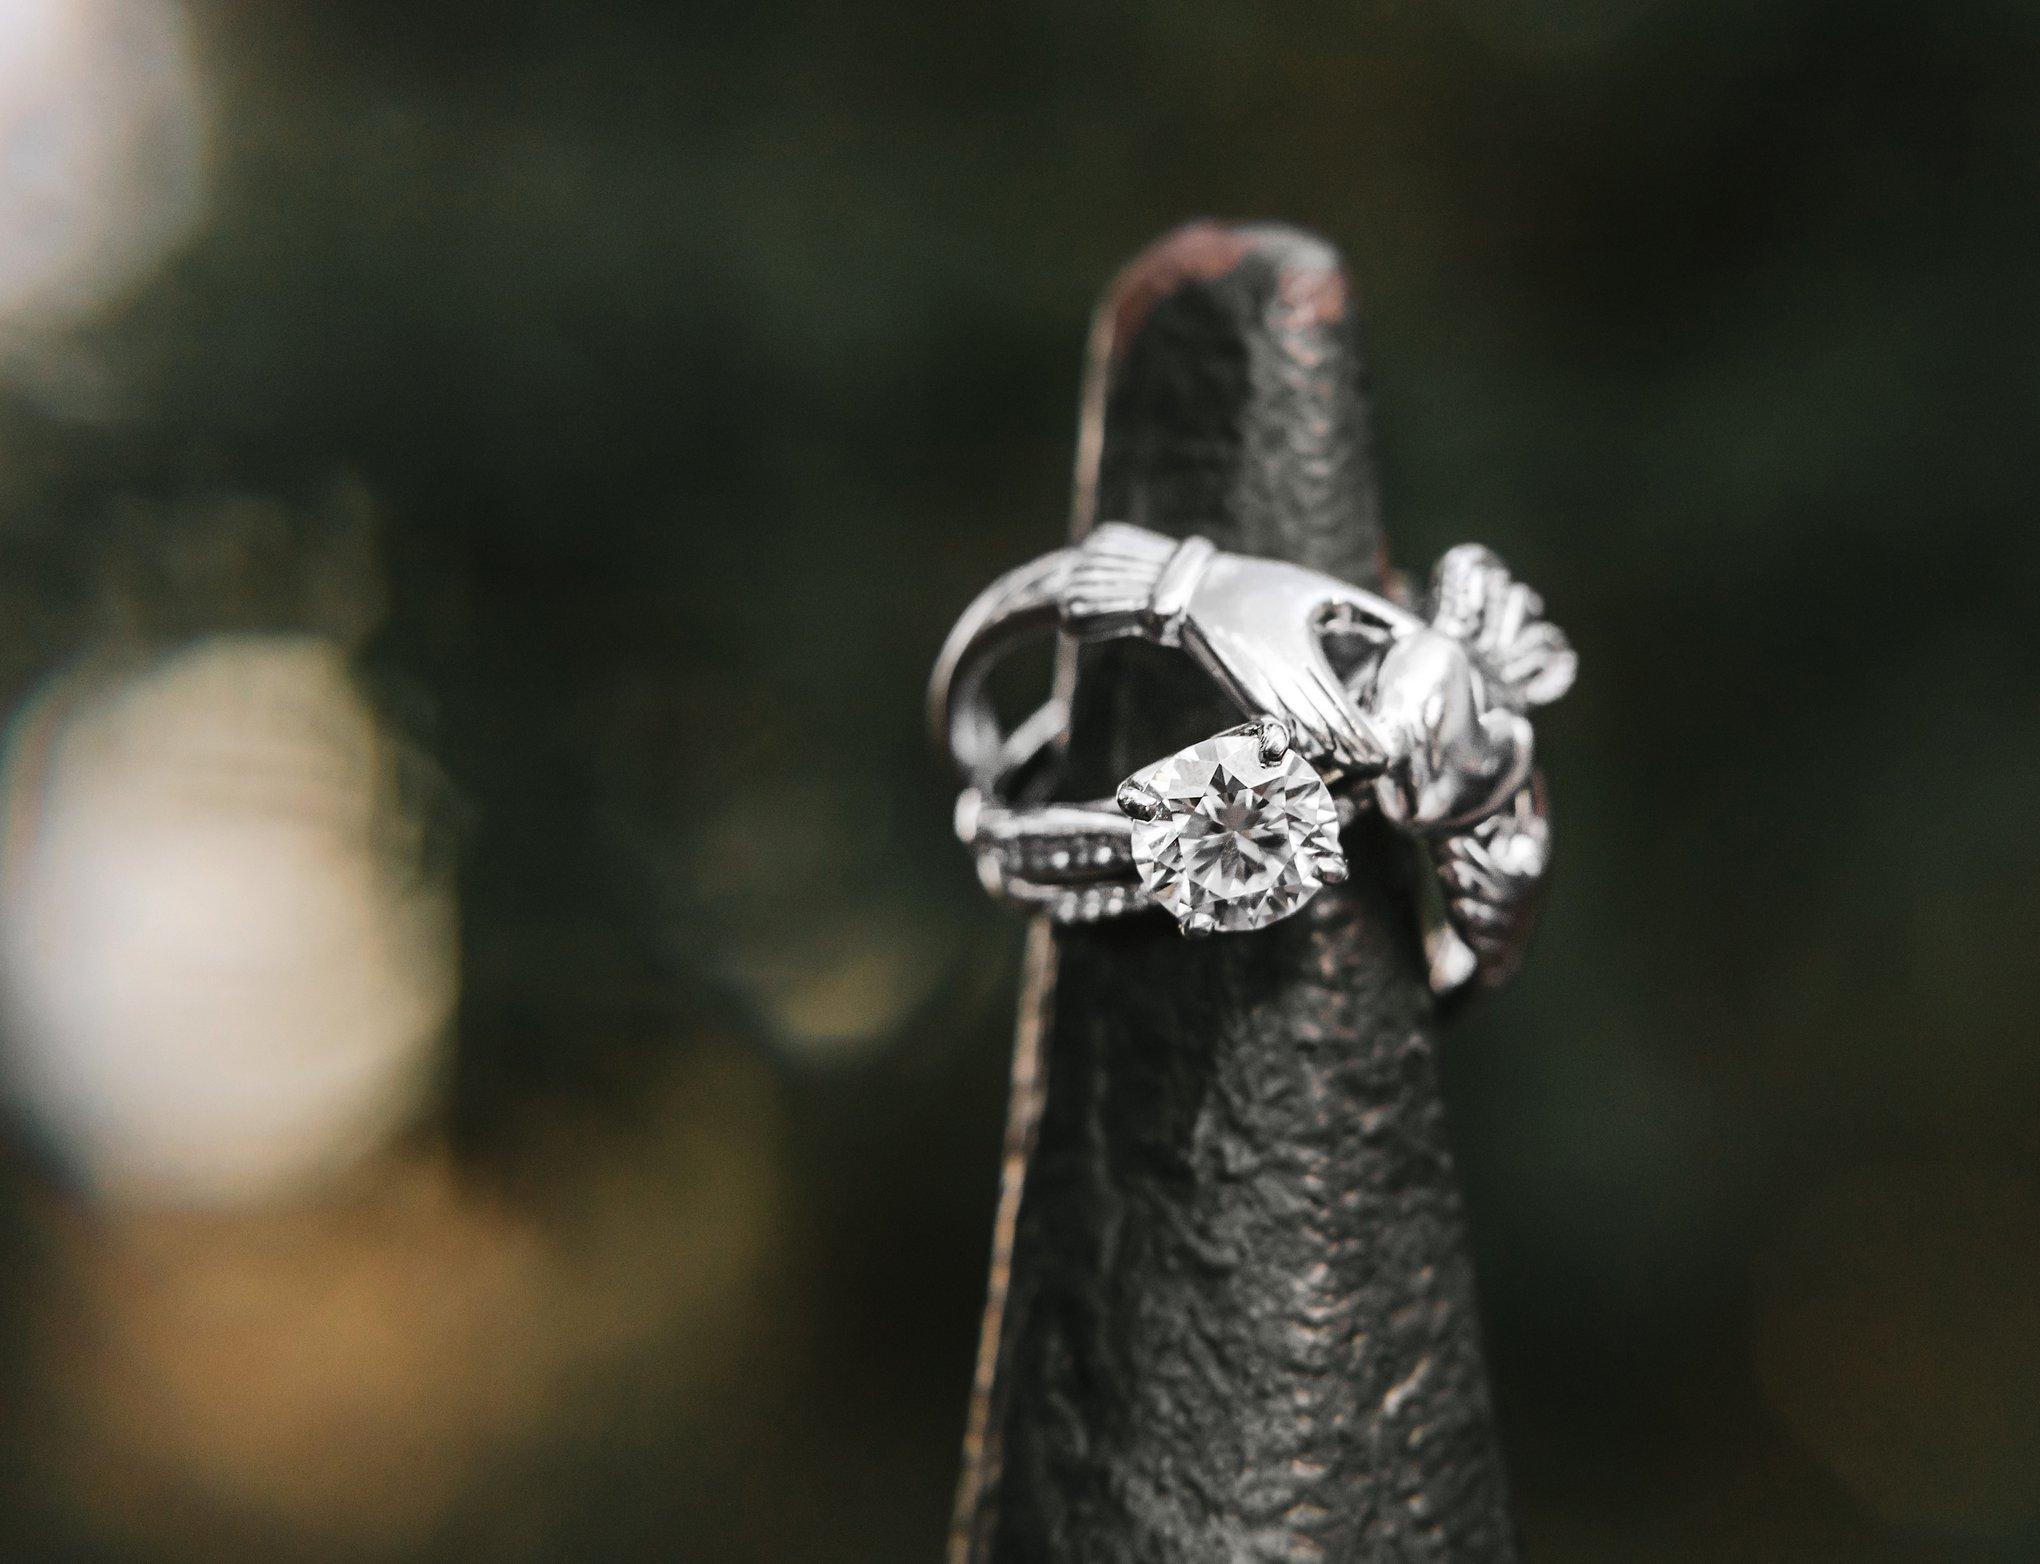 Boston-City-Hall-Wedding-Elopement-Photographer-Lena-Mirisola-18.JPG